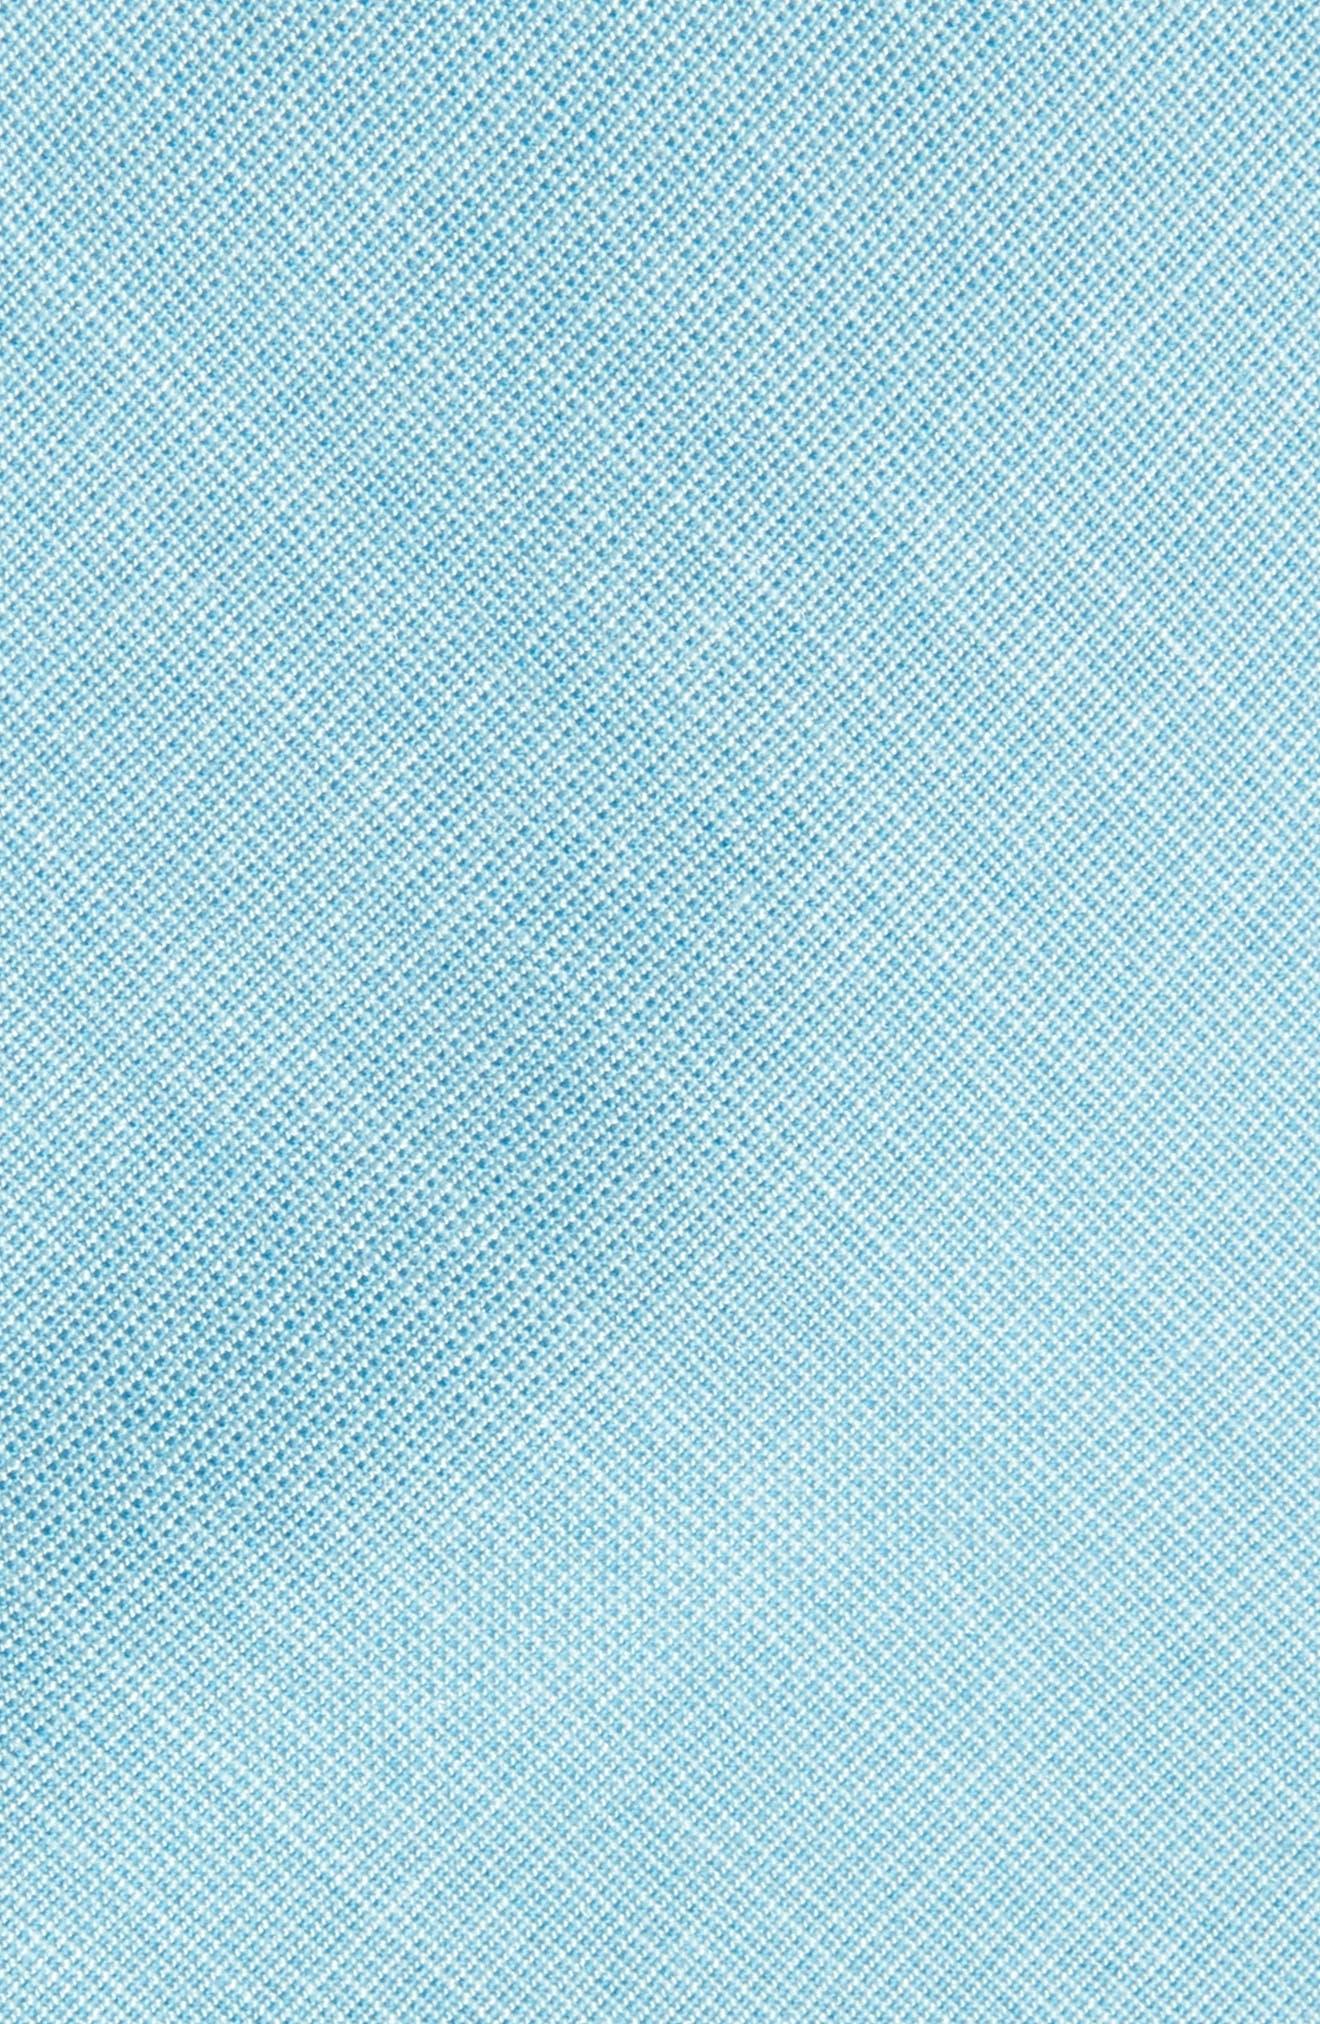 Jeffry Solid Skinny Tie,                             Alternate thumbnail 2, color,                             450